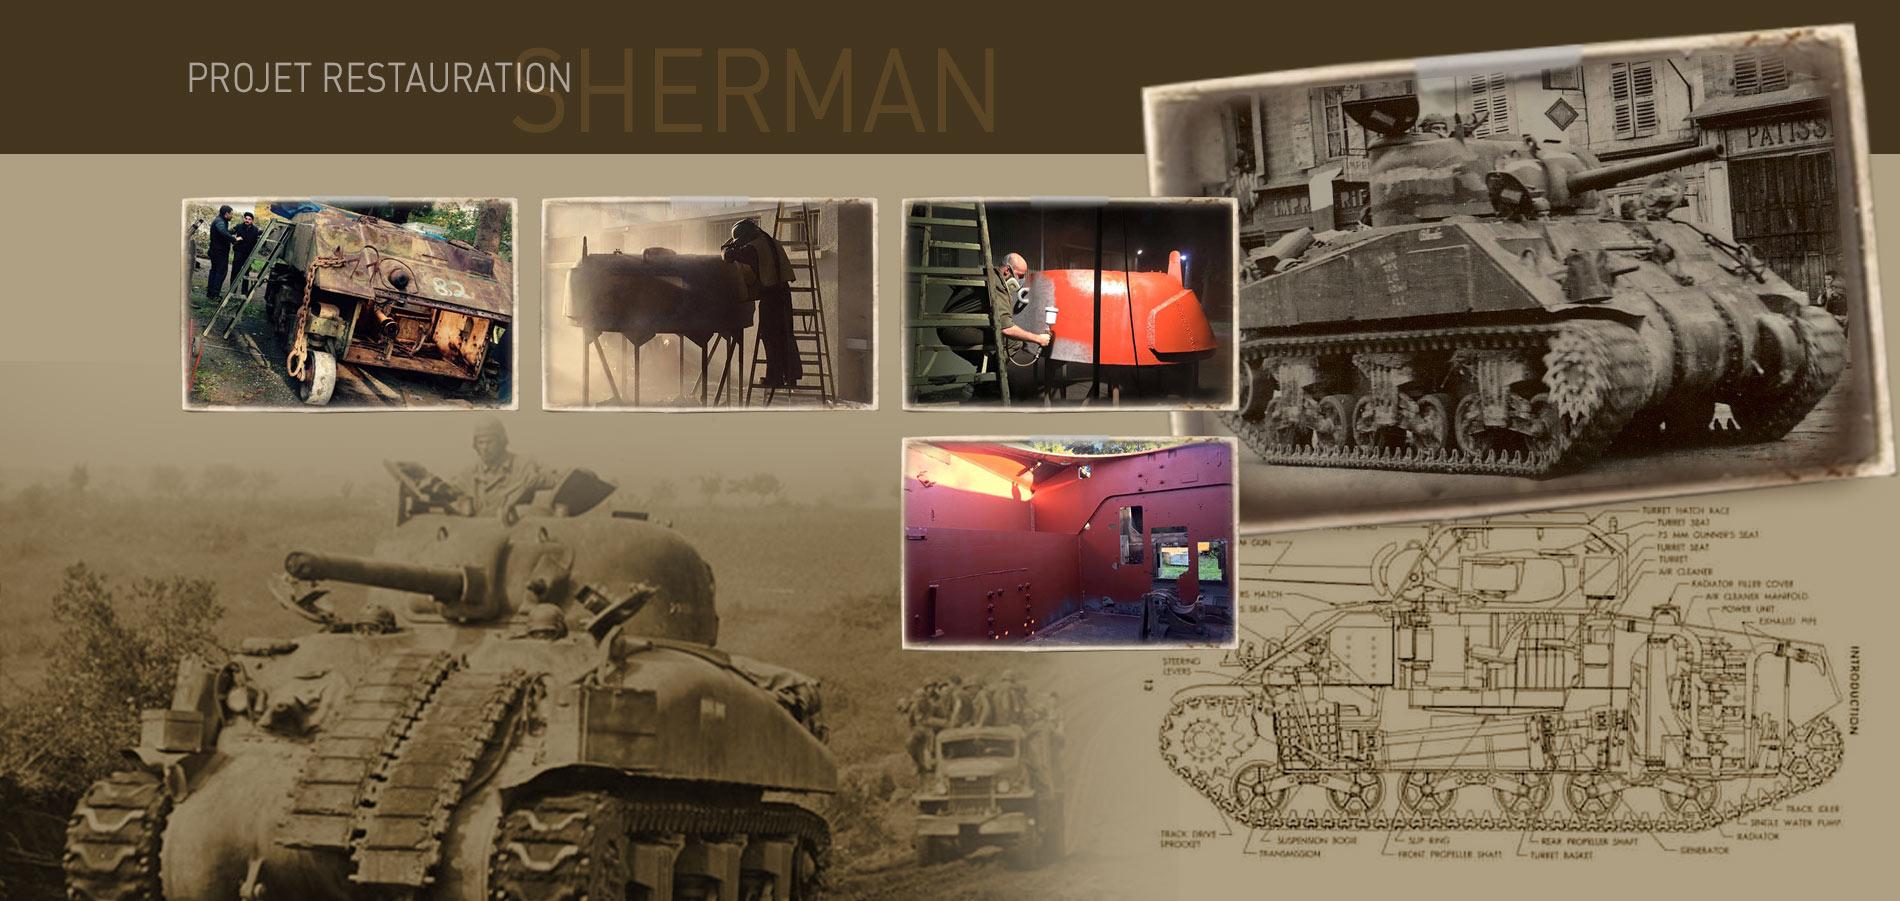 Restauration Sherman